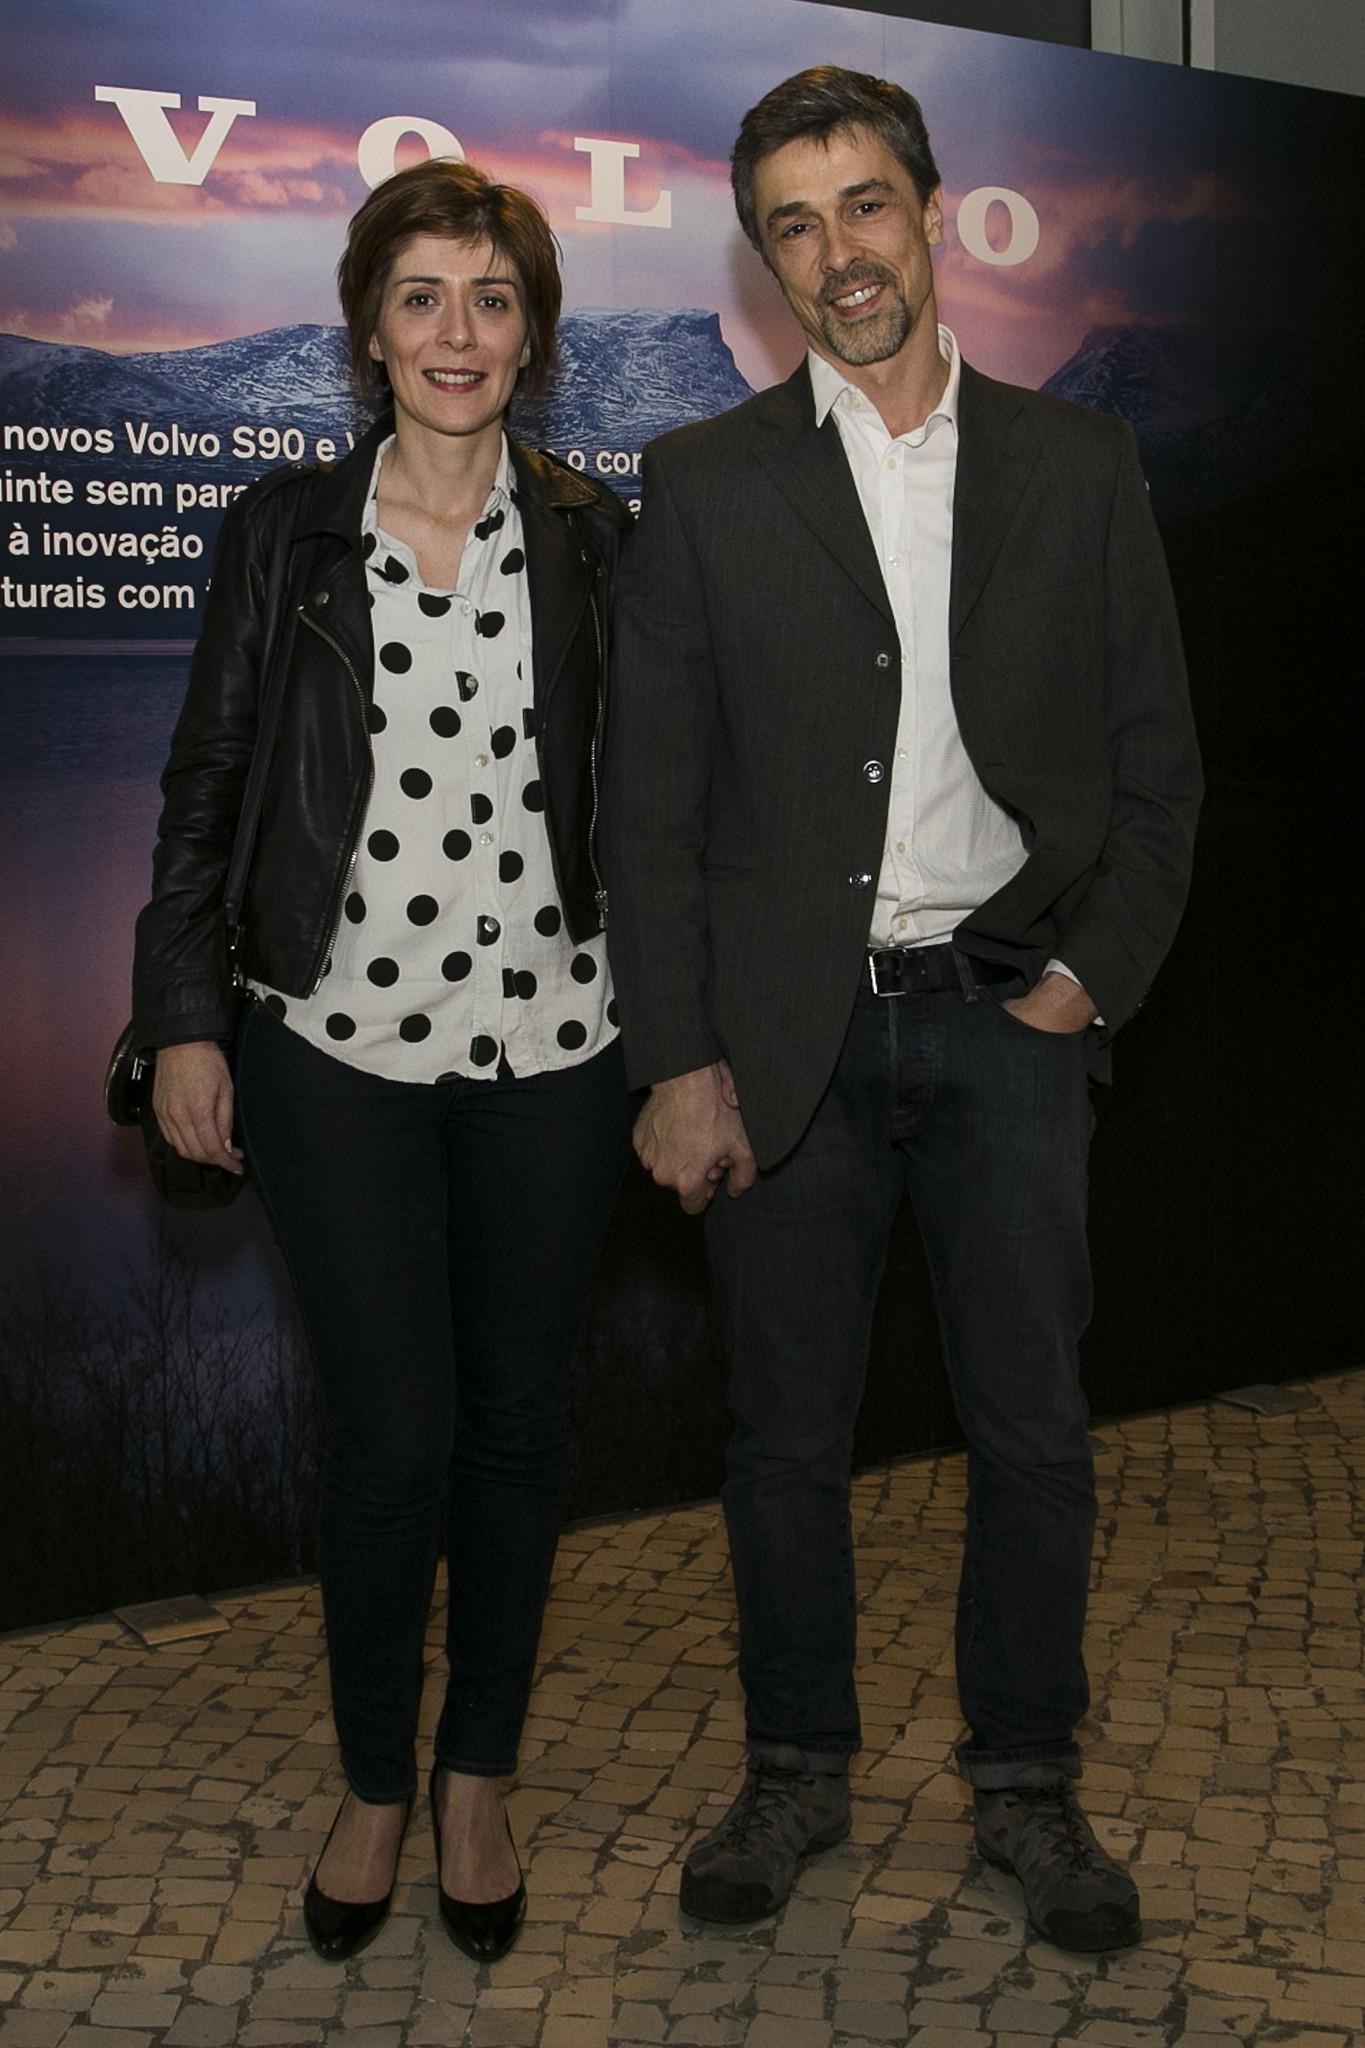 Vitor Gonçalves e mulher